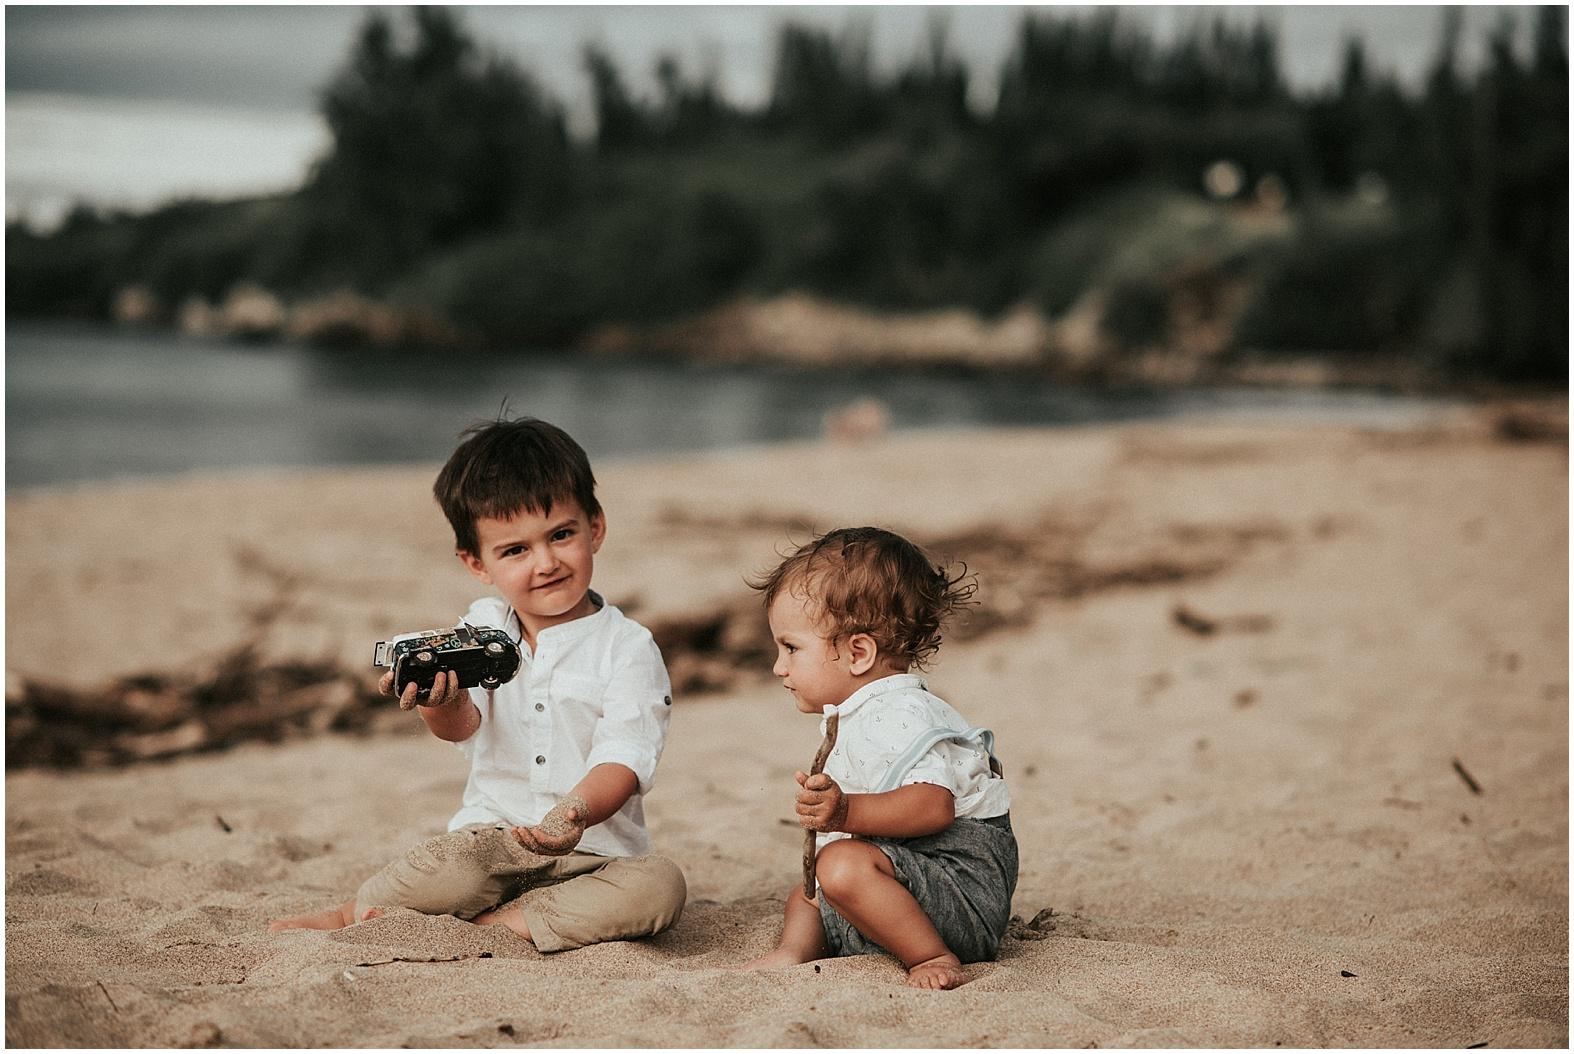 Maui family photography3.jpg